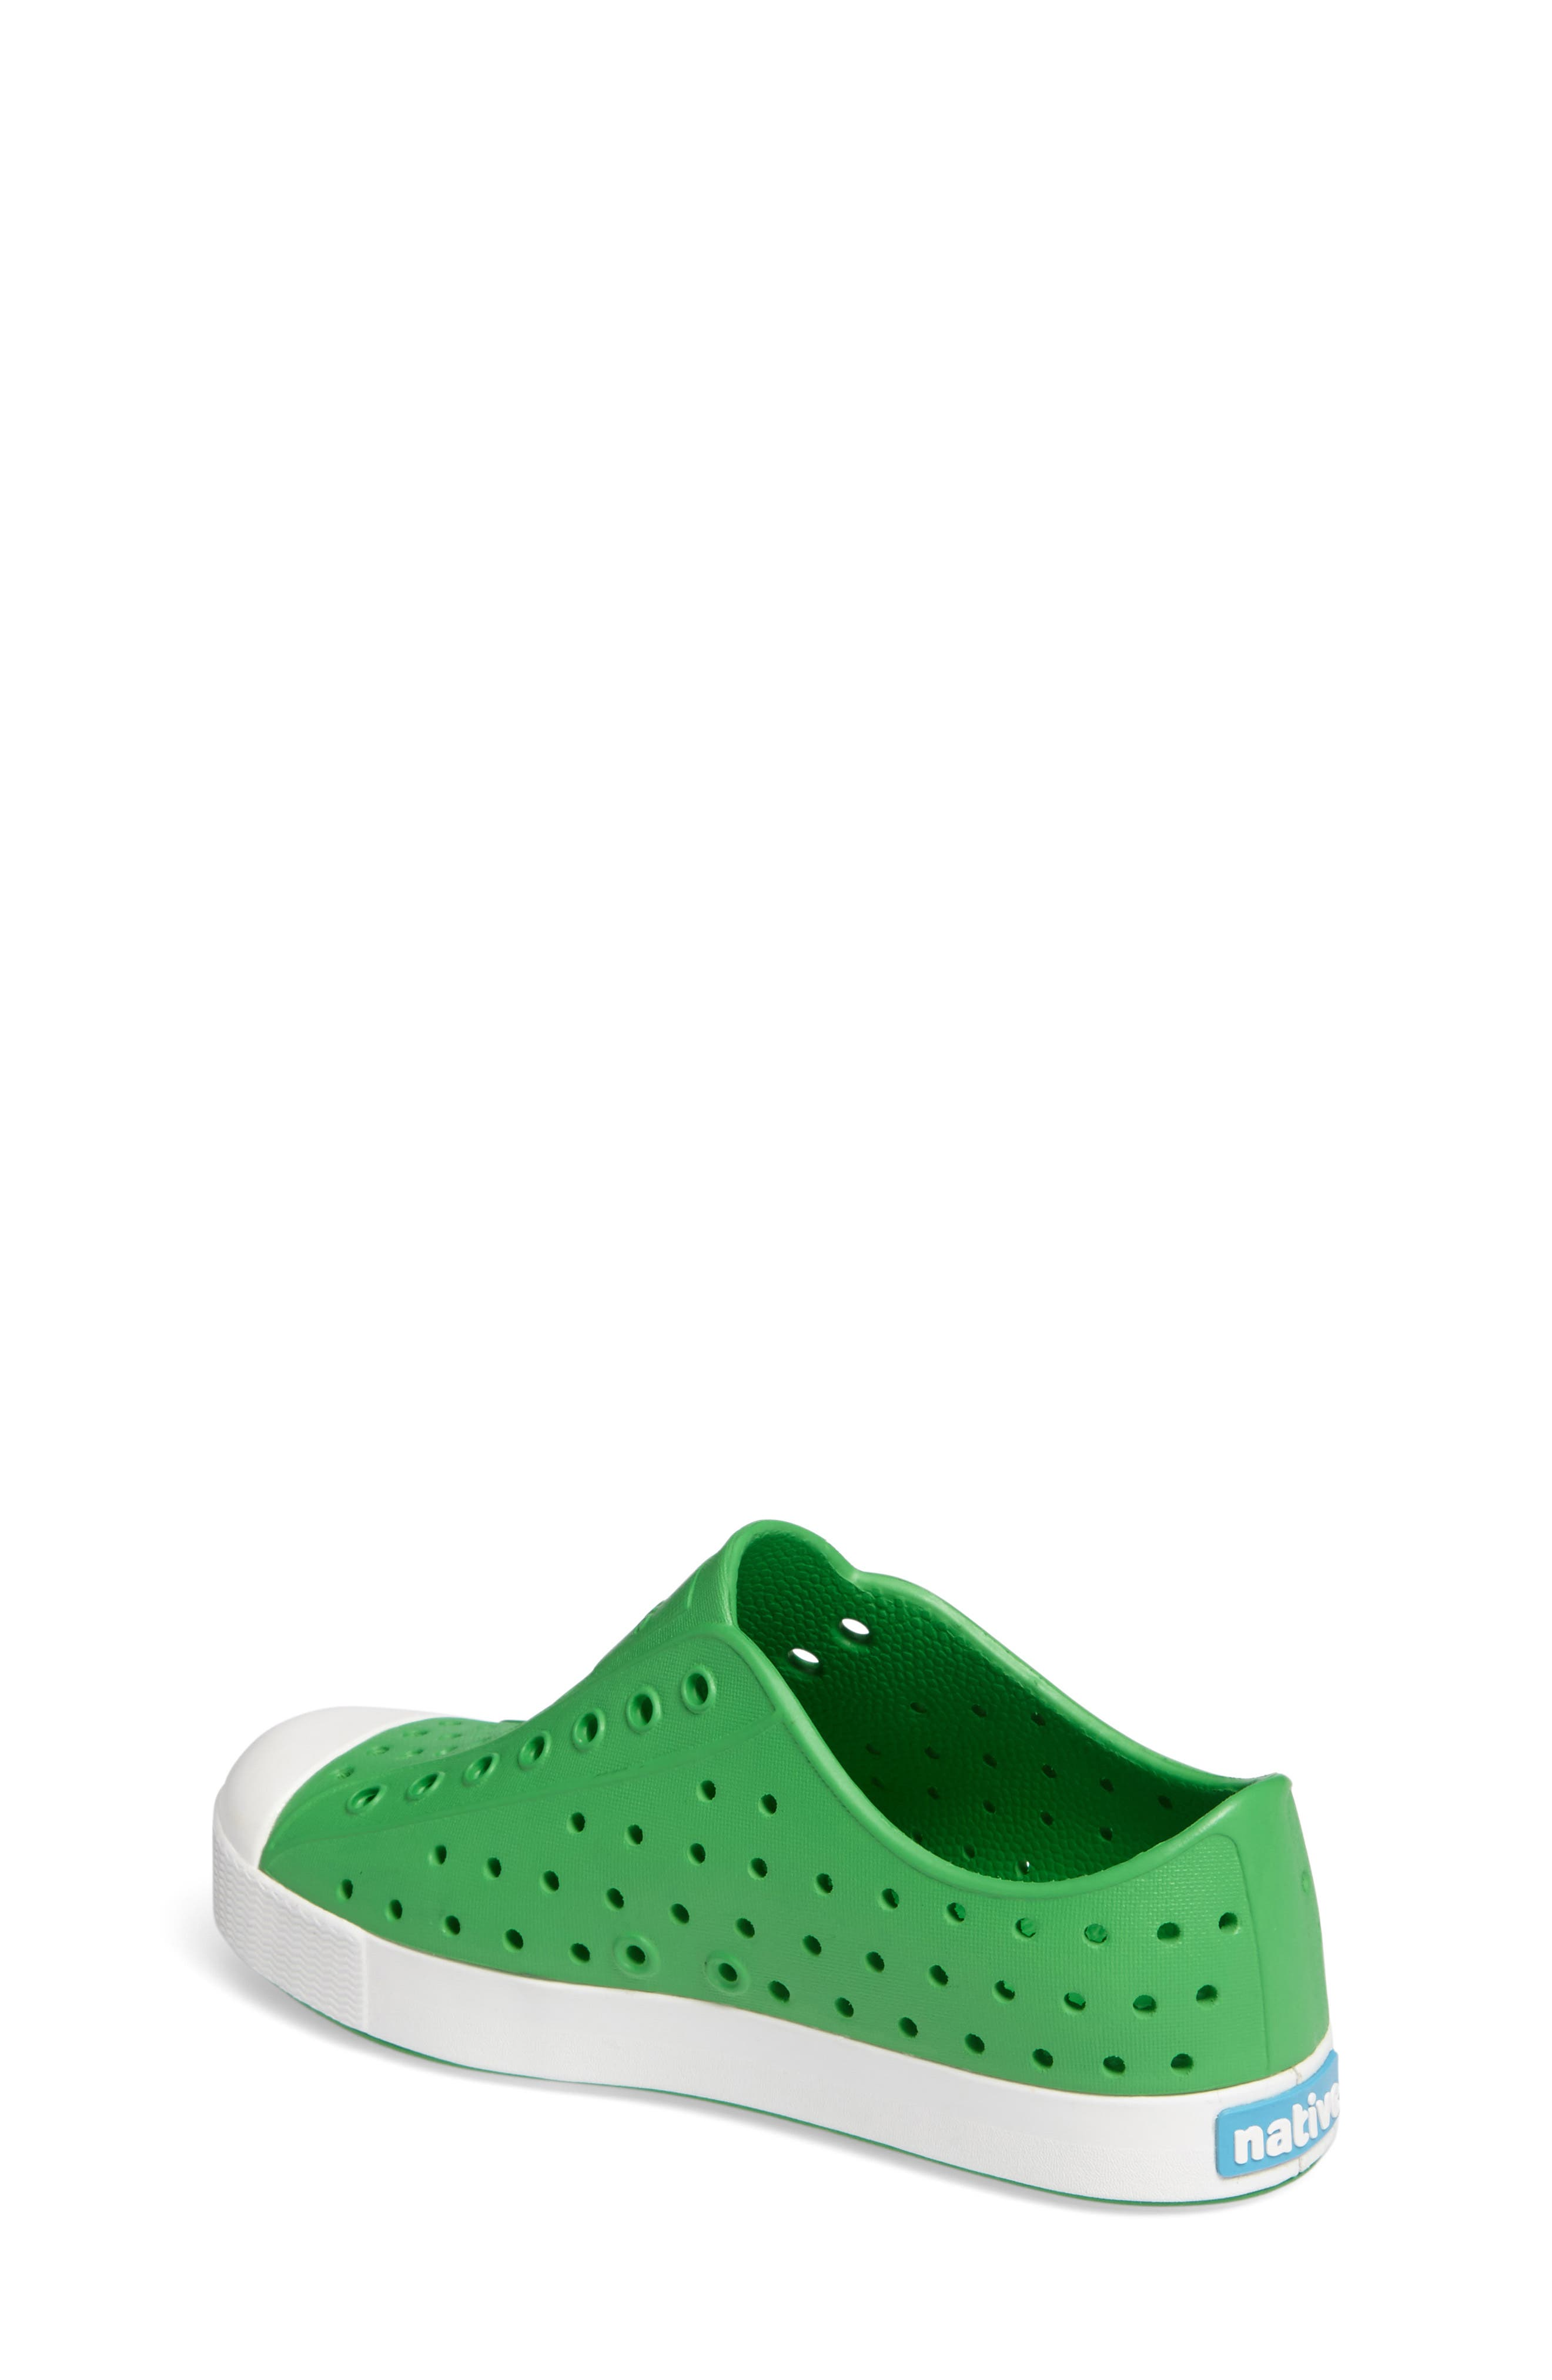 'Jefferson' Water Friendly Slip-On Sneaker,                             Alternate thumbnail 119, color,